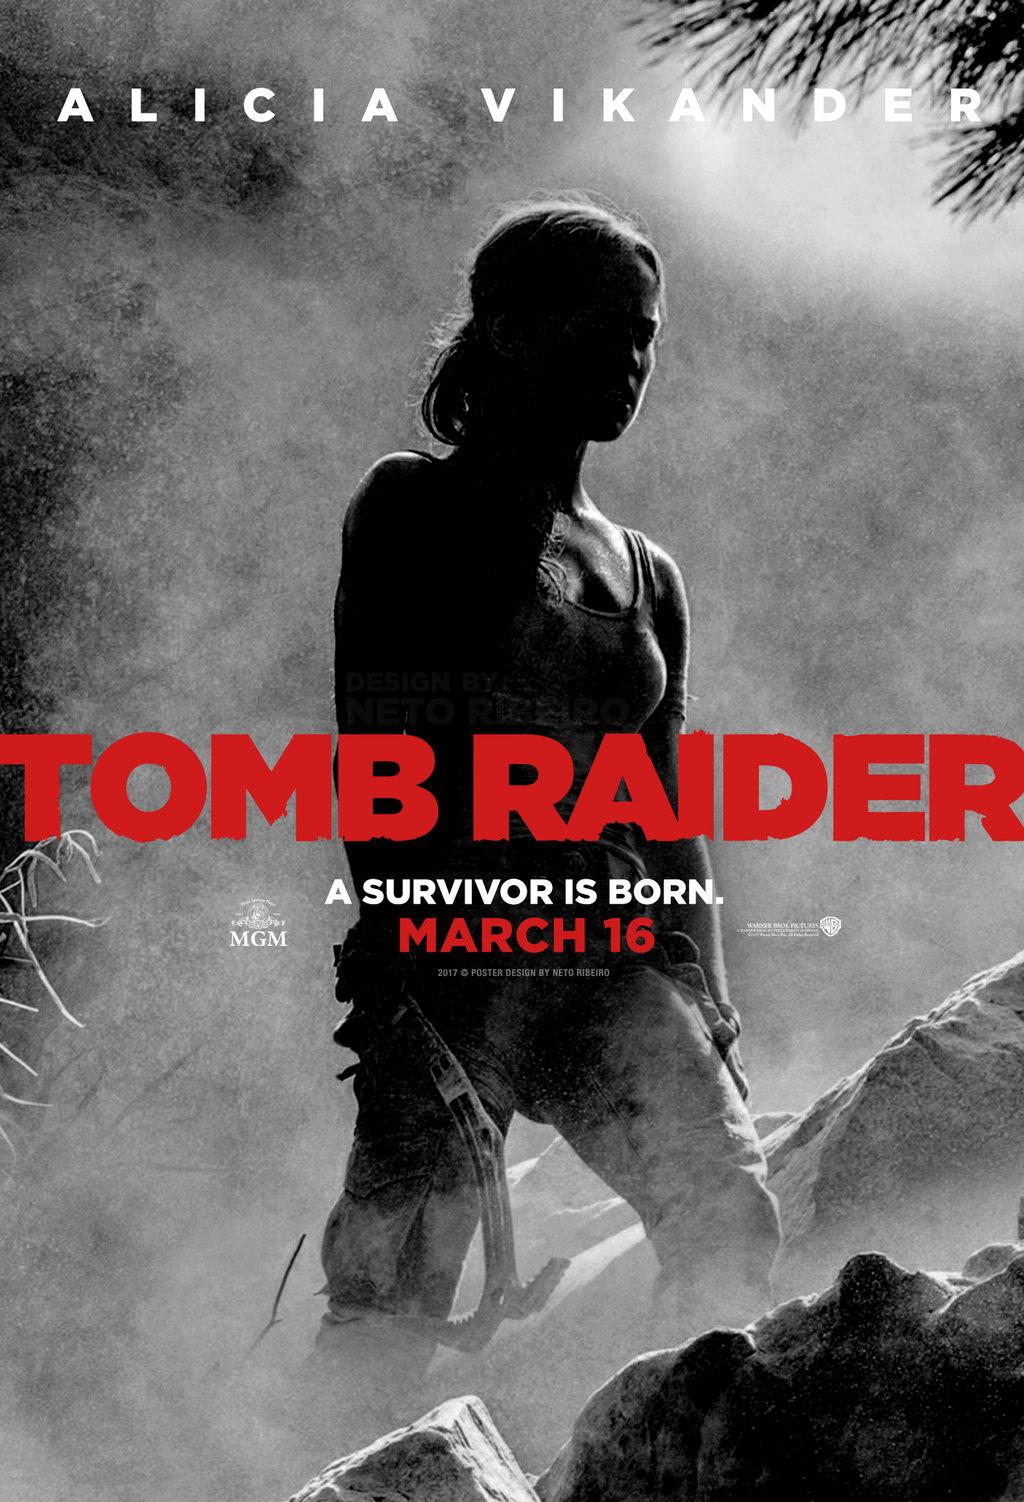 tomb raider movie poster hd